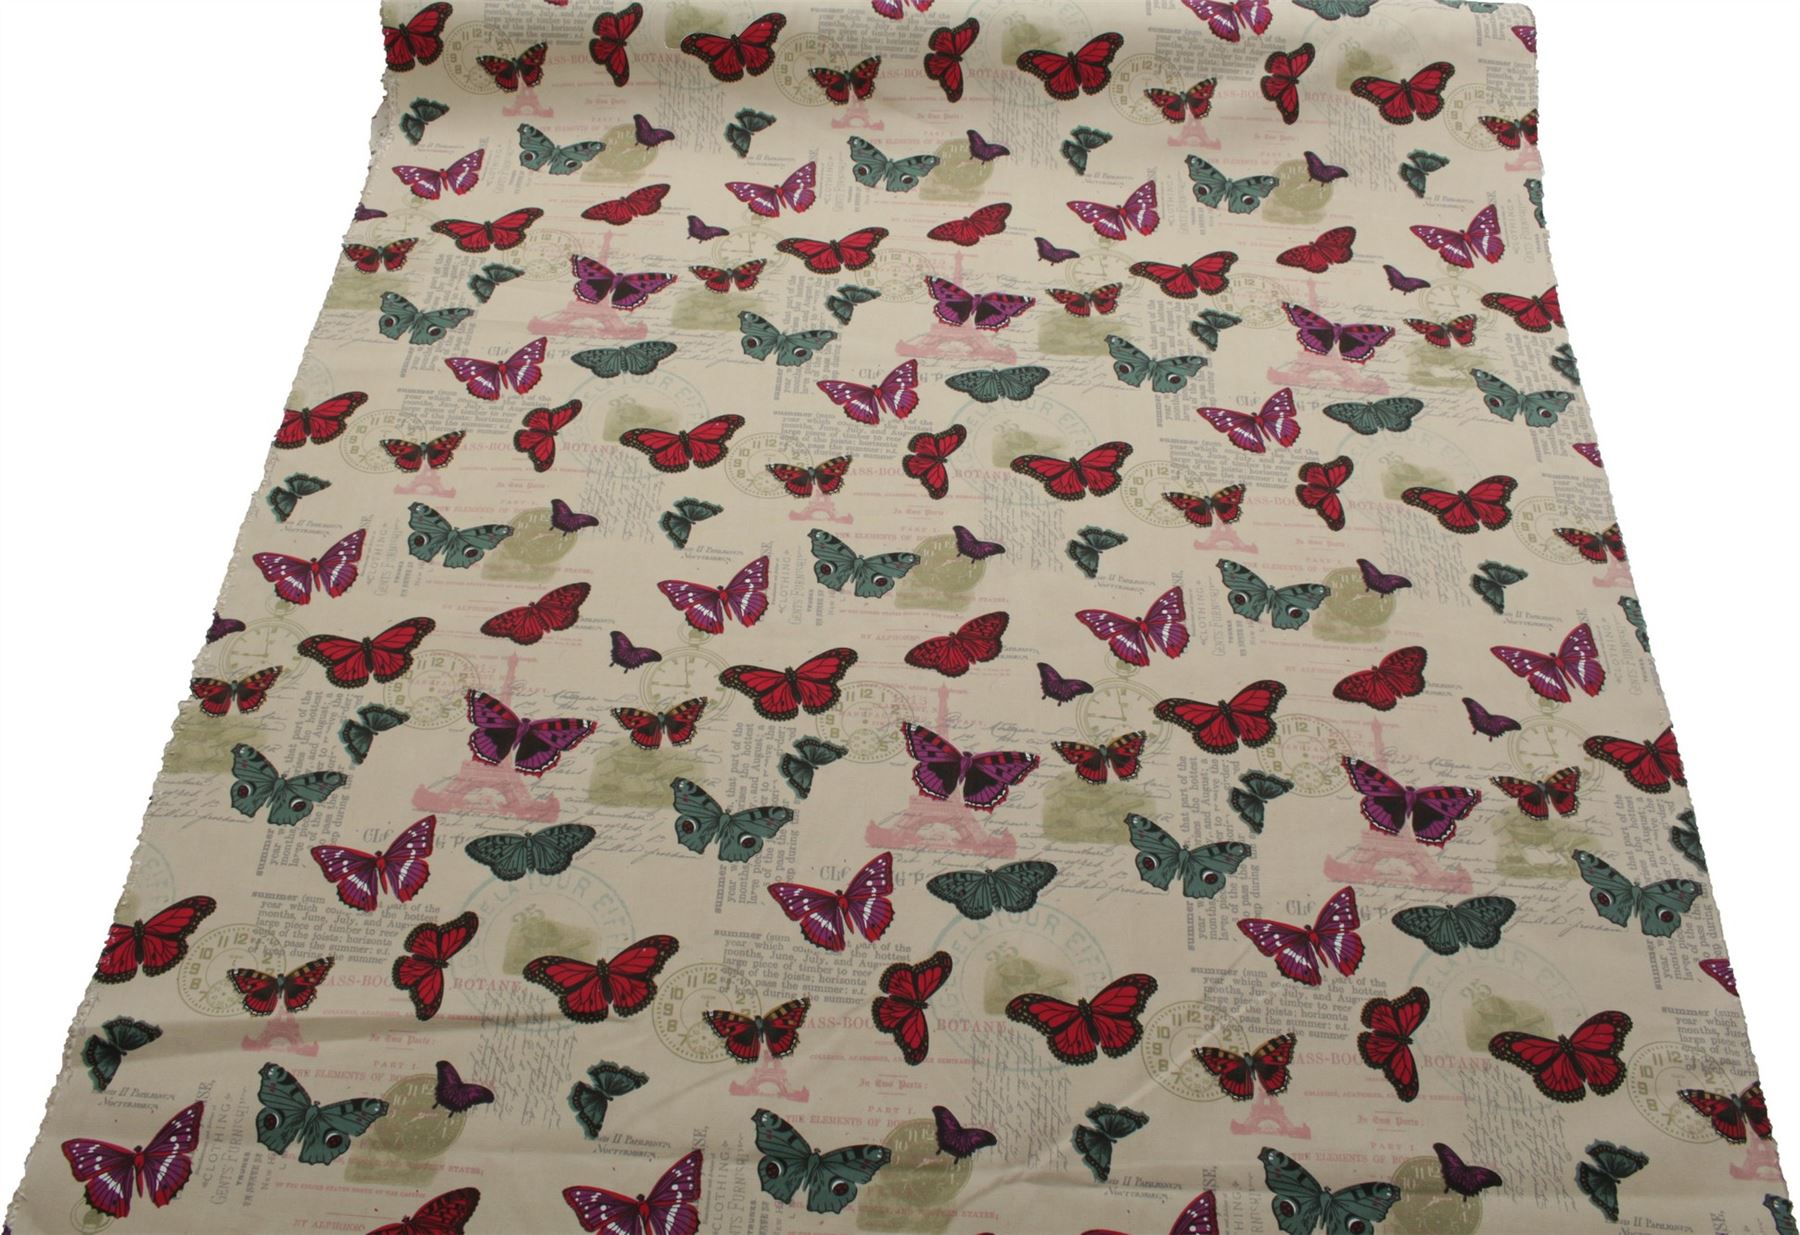 thumbnail 65 - 100% Heavy Cotton Panama Printed Childrens Curtain Cushion Upholstery Fabric